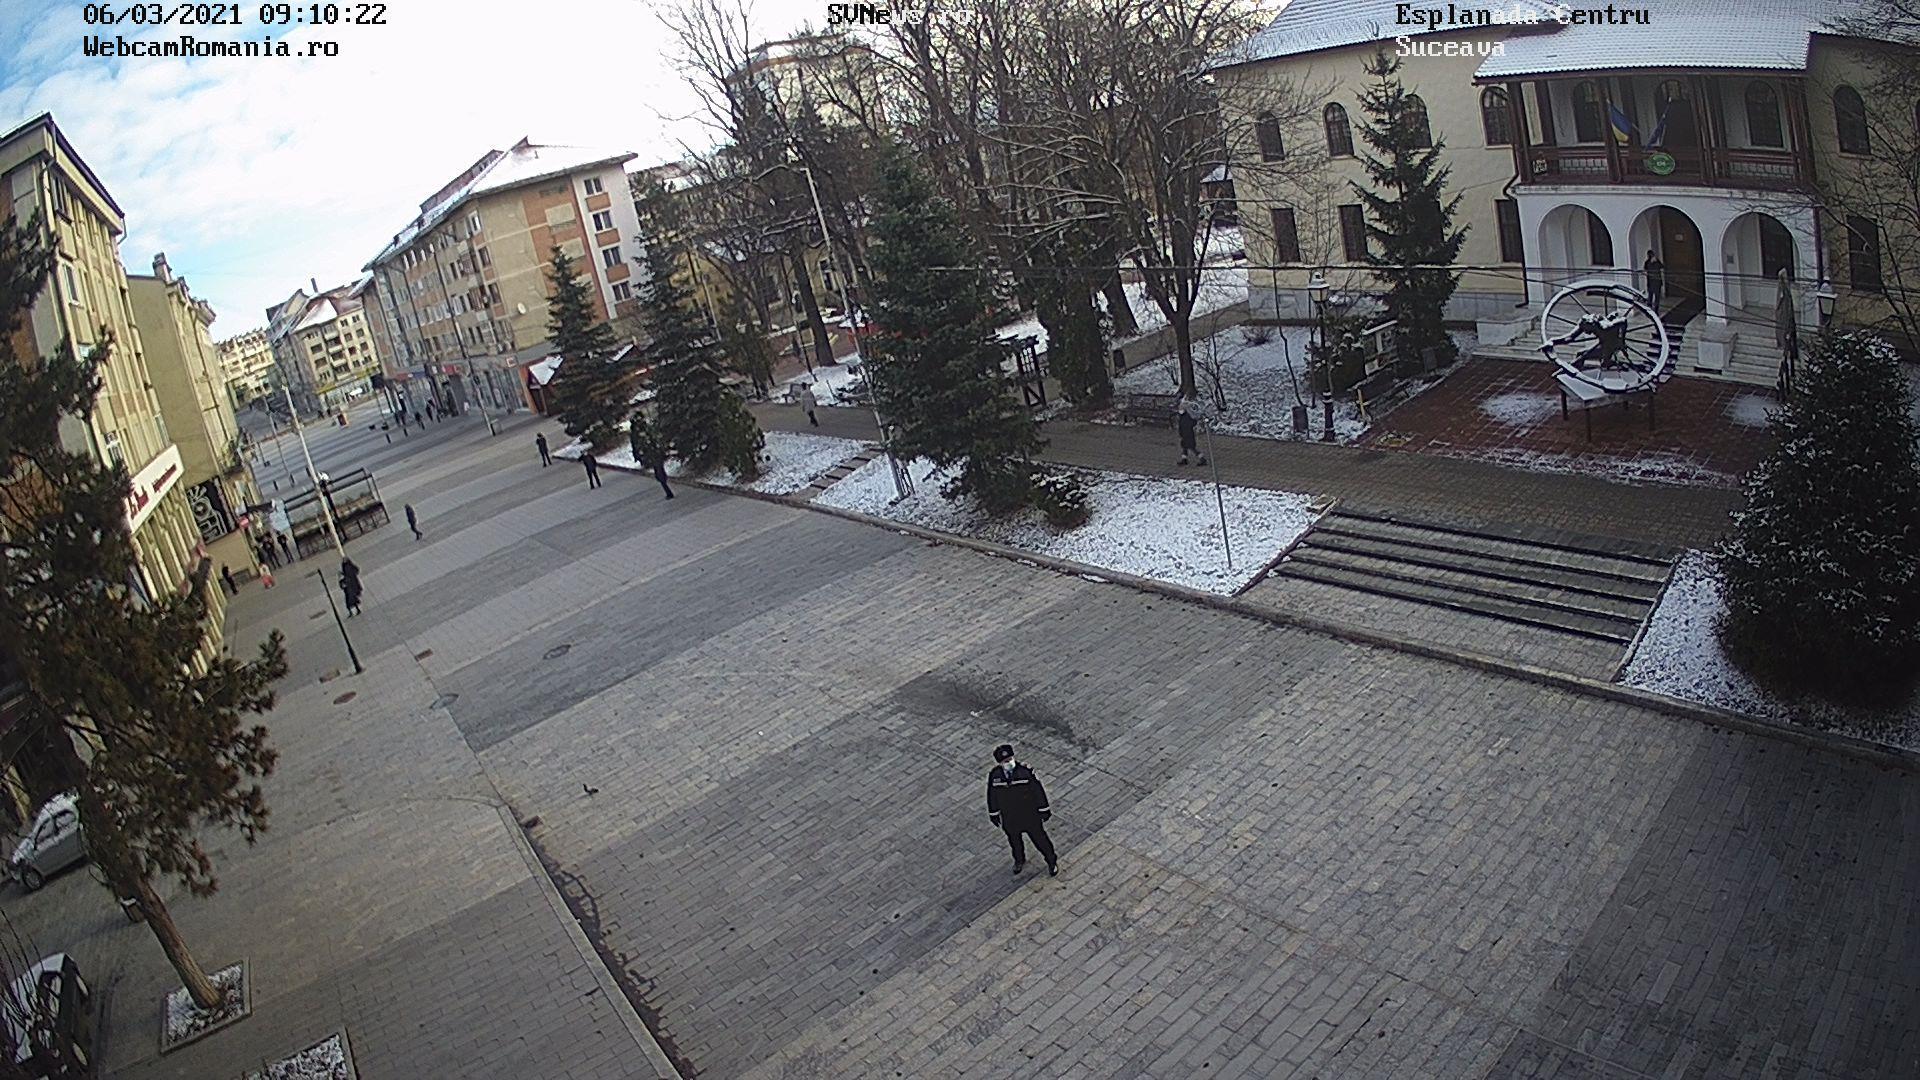 Webcam Suceava: Webcam − Esplanada Centru